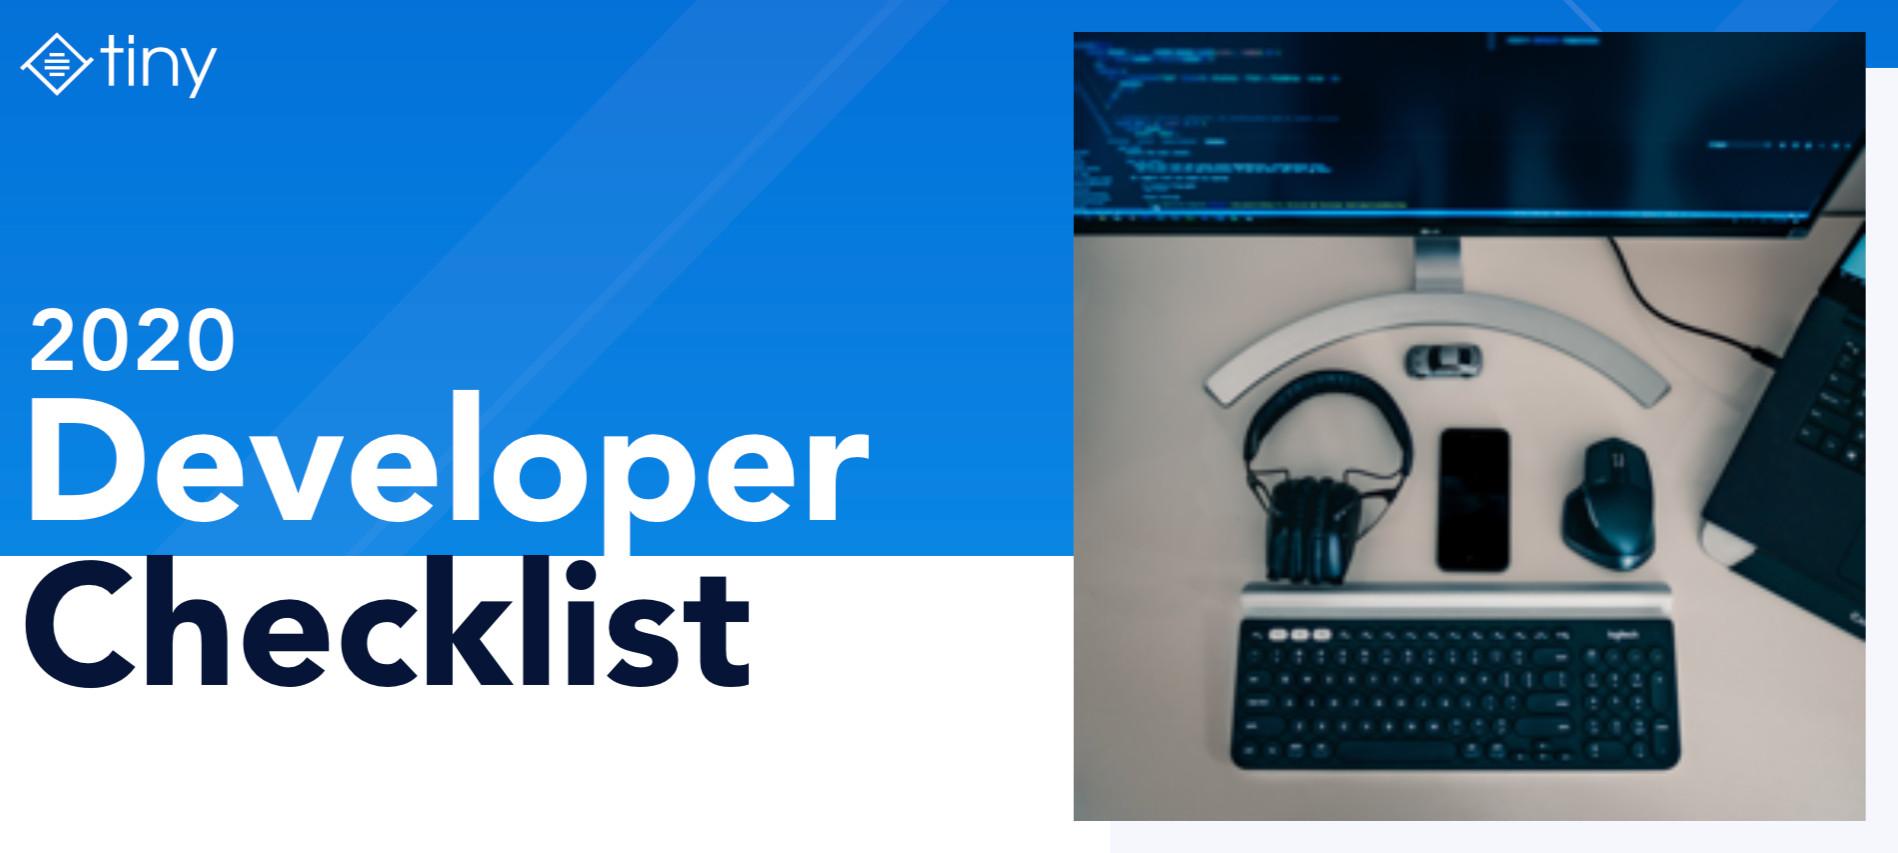 2020 developer checklist.